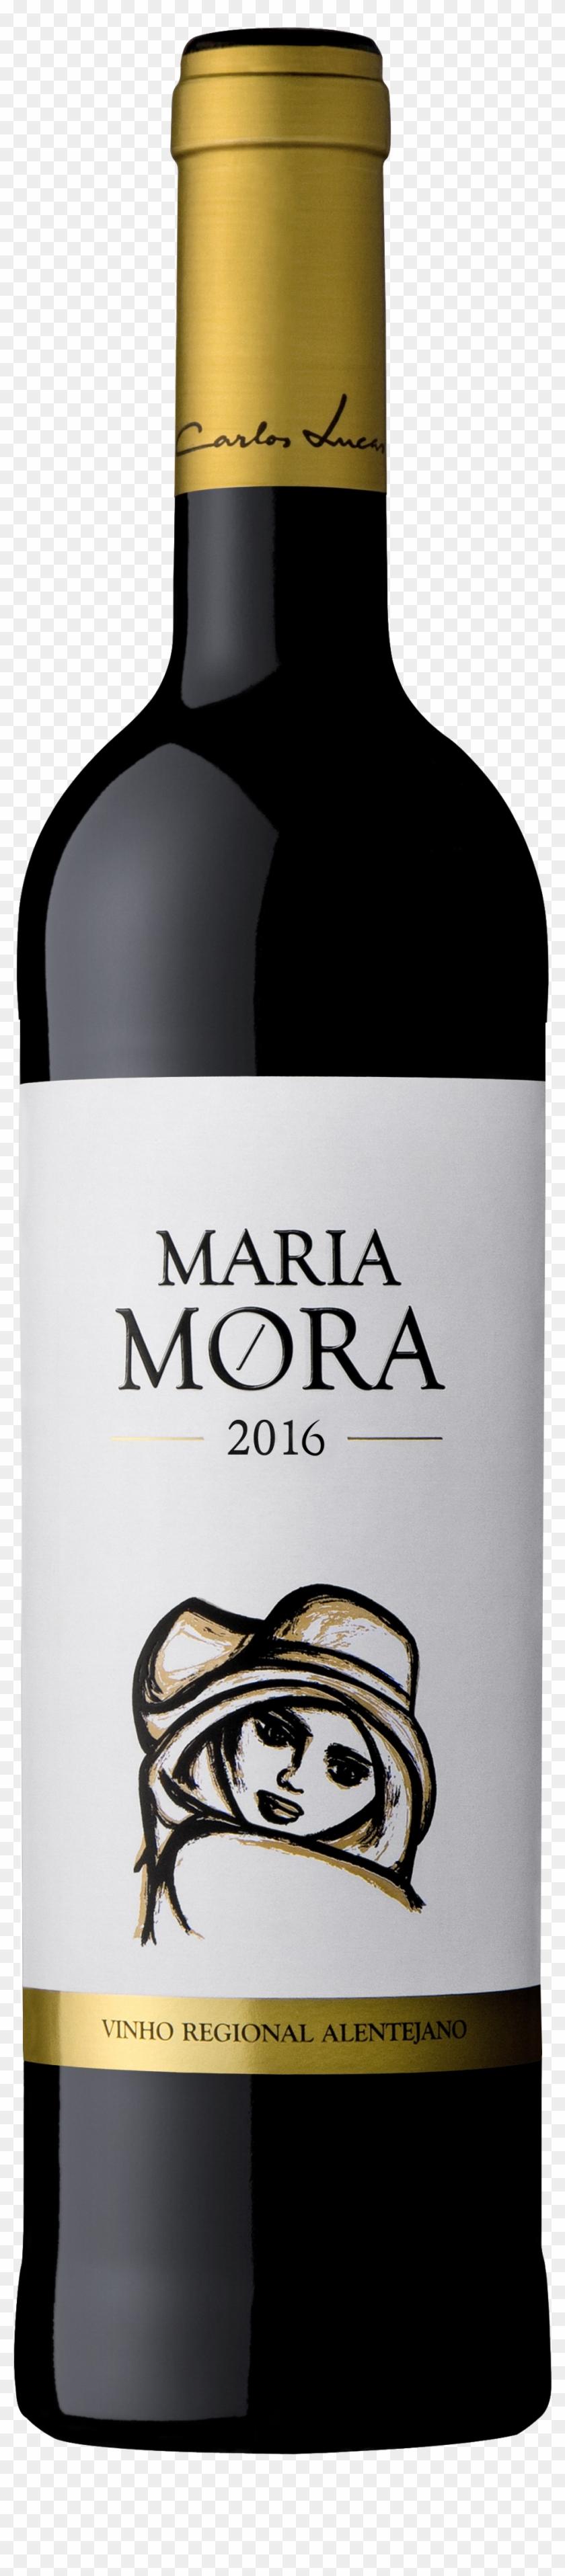 Maria Mora Red - Negru De Milestii Mici 1987 Clipart #4453329